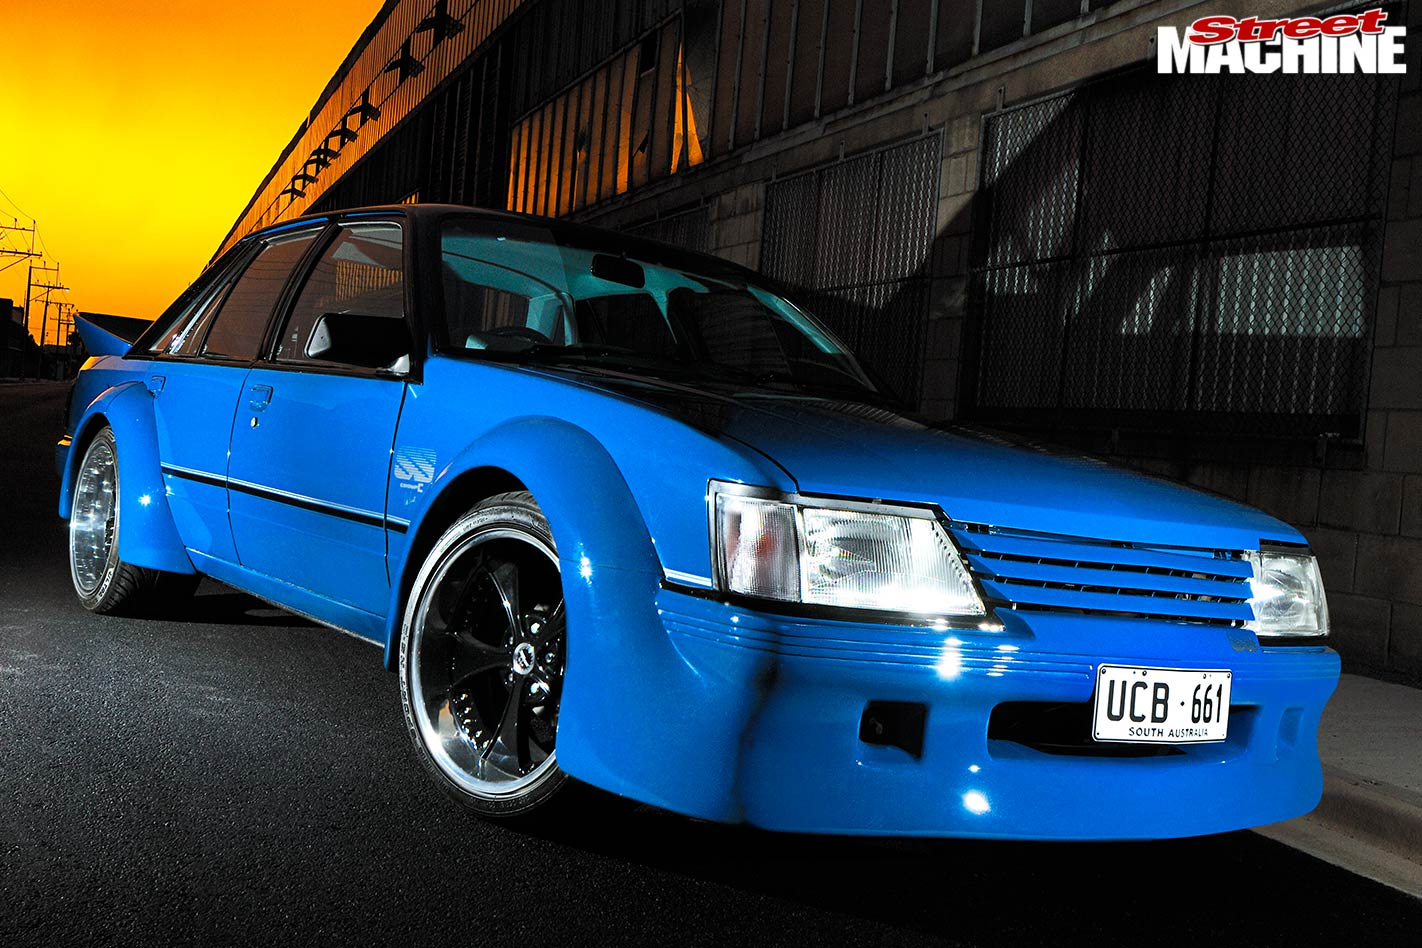 Holden VK Commodore Group C replica